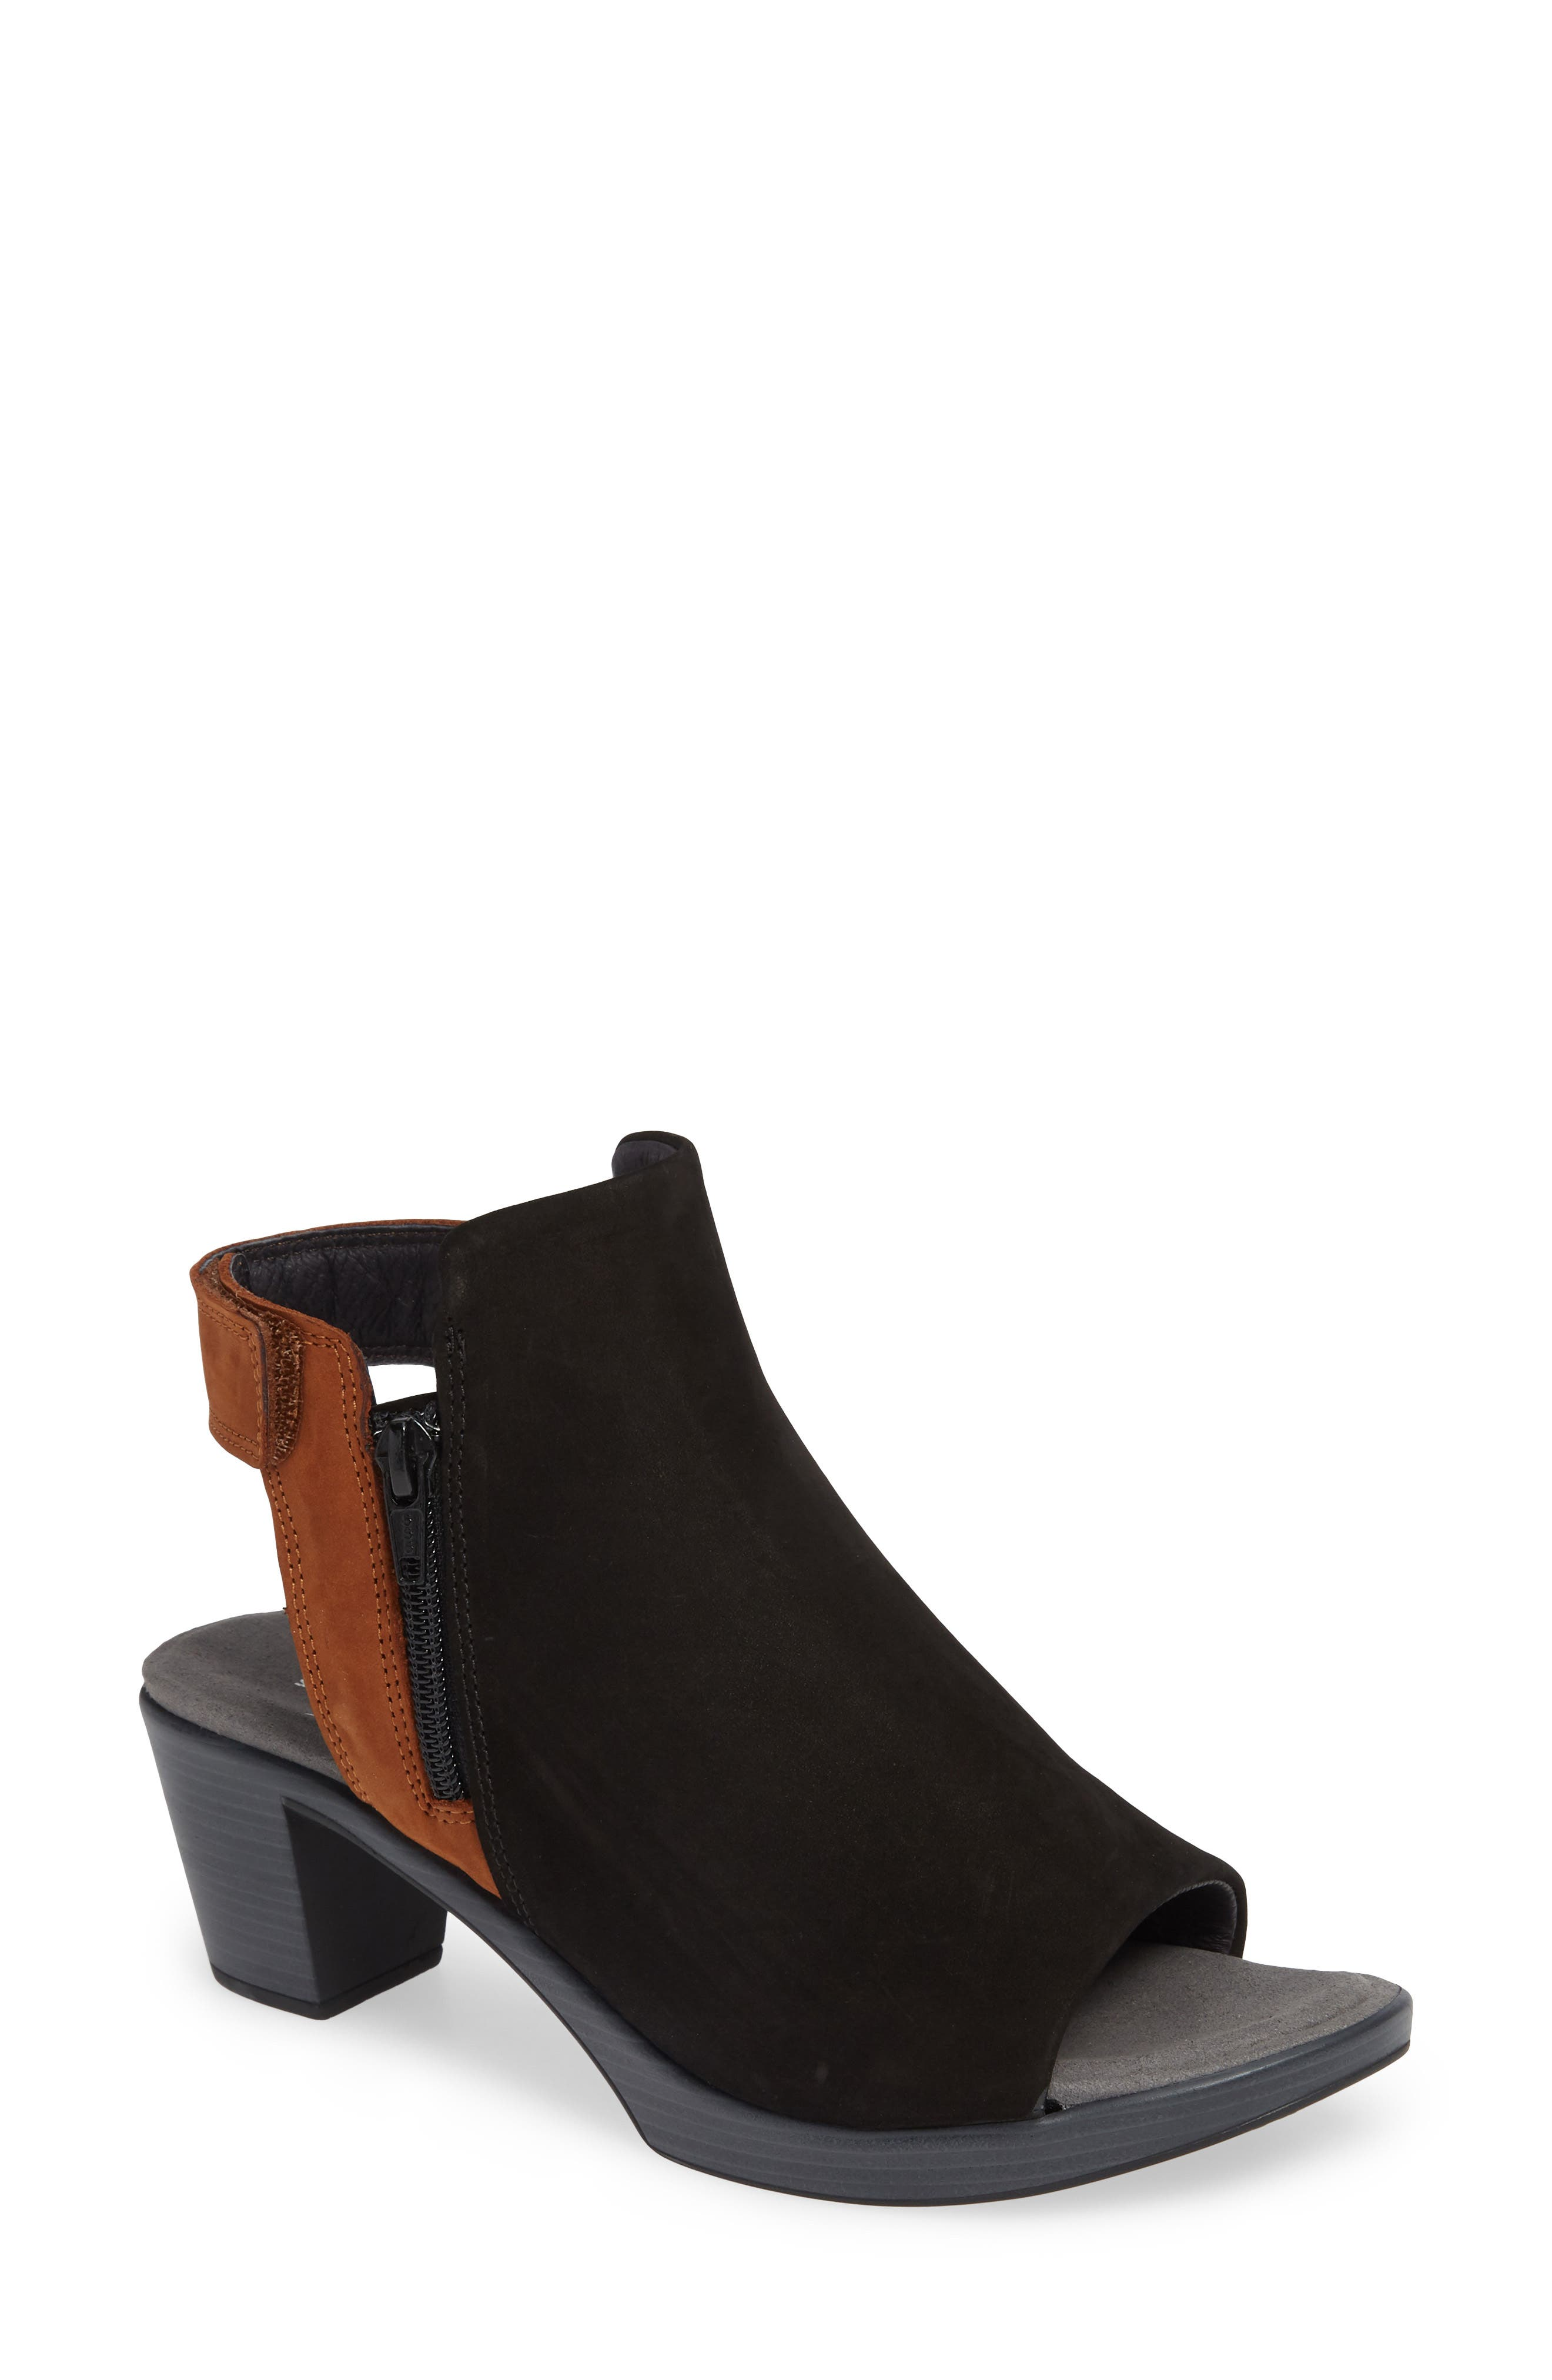 NAOT Favorite Sandal, Main, color, BLACK/ HAWAIIAN BROWN NUBUCK